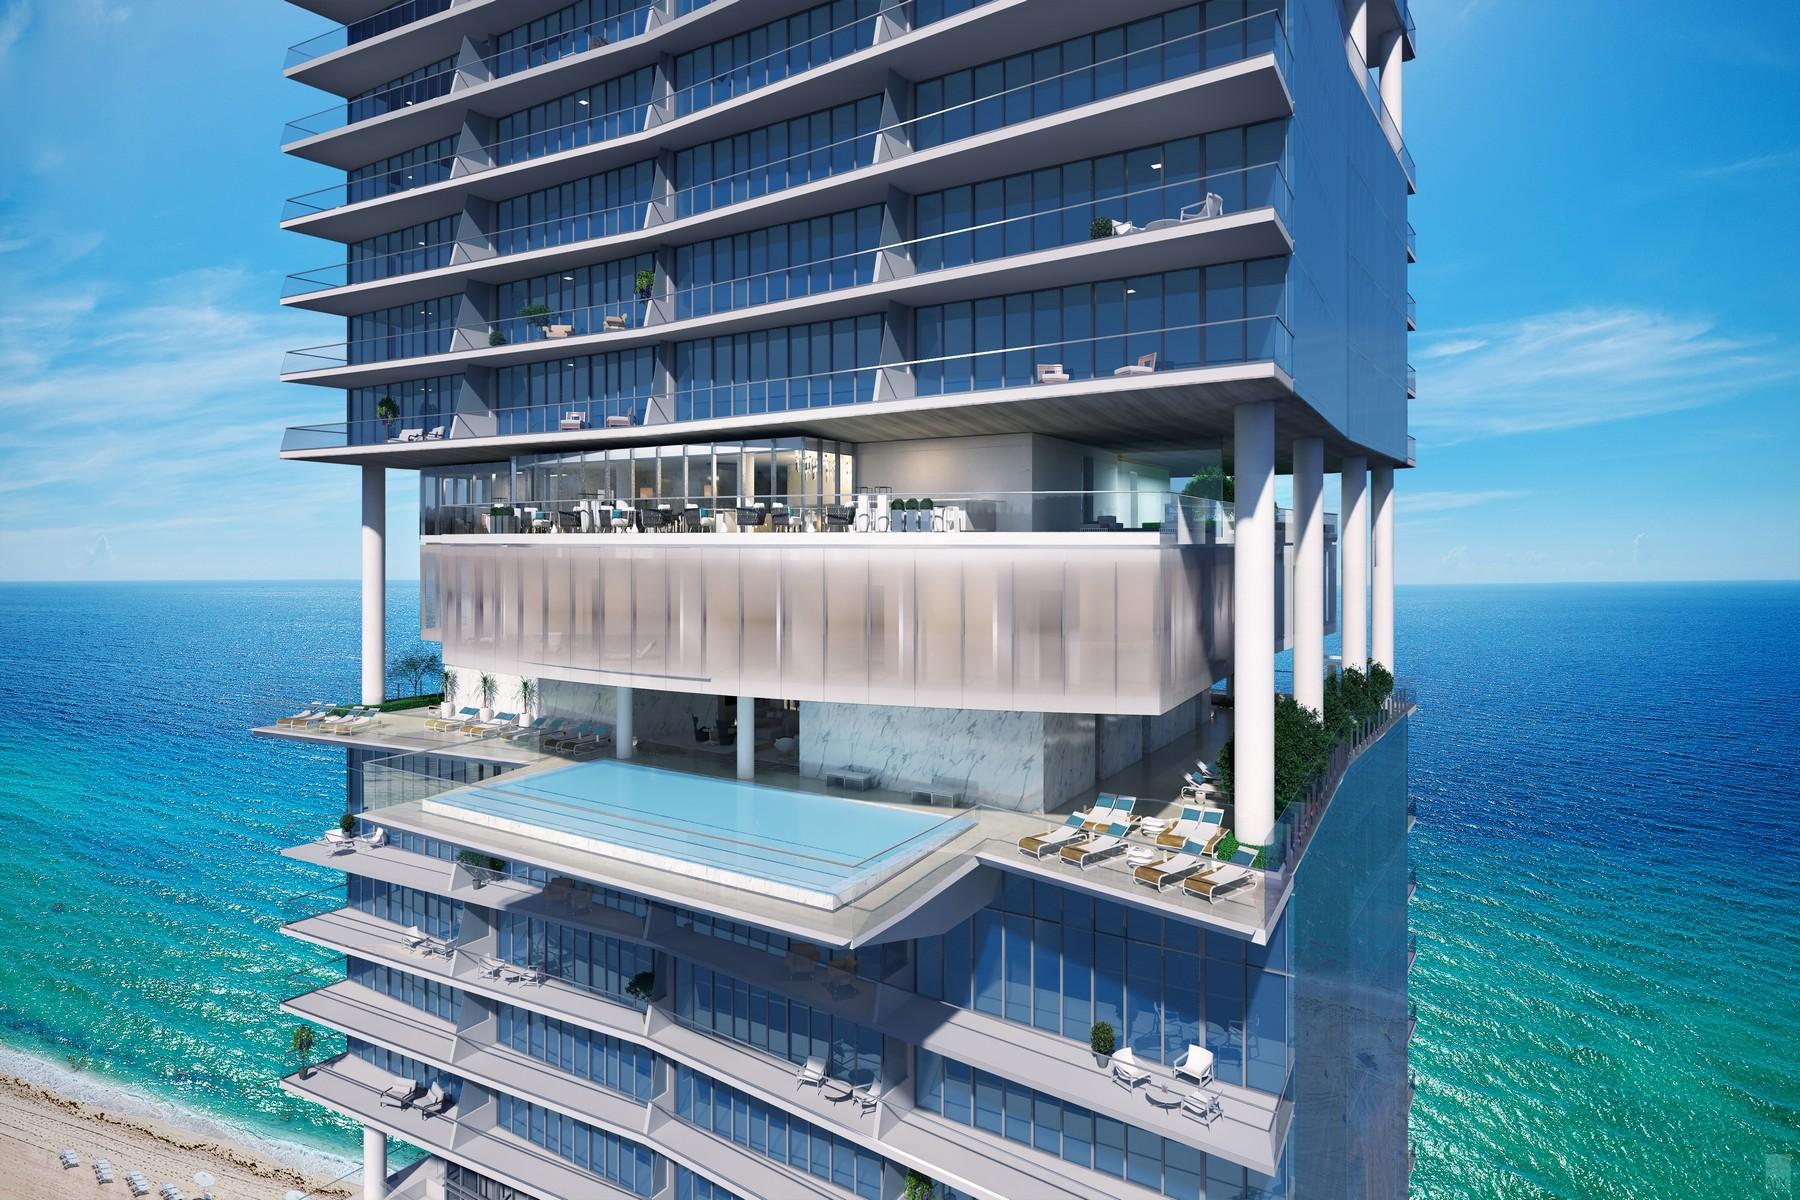 Condominium for Sale at Turnberry Ocean Club 18501Collins Ave 903 Sunny Isles Beach, Florida, 33160 United States